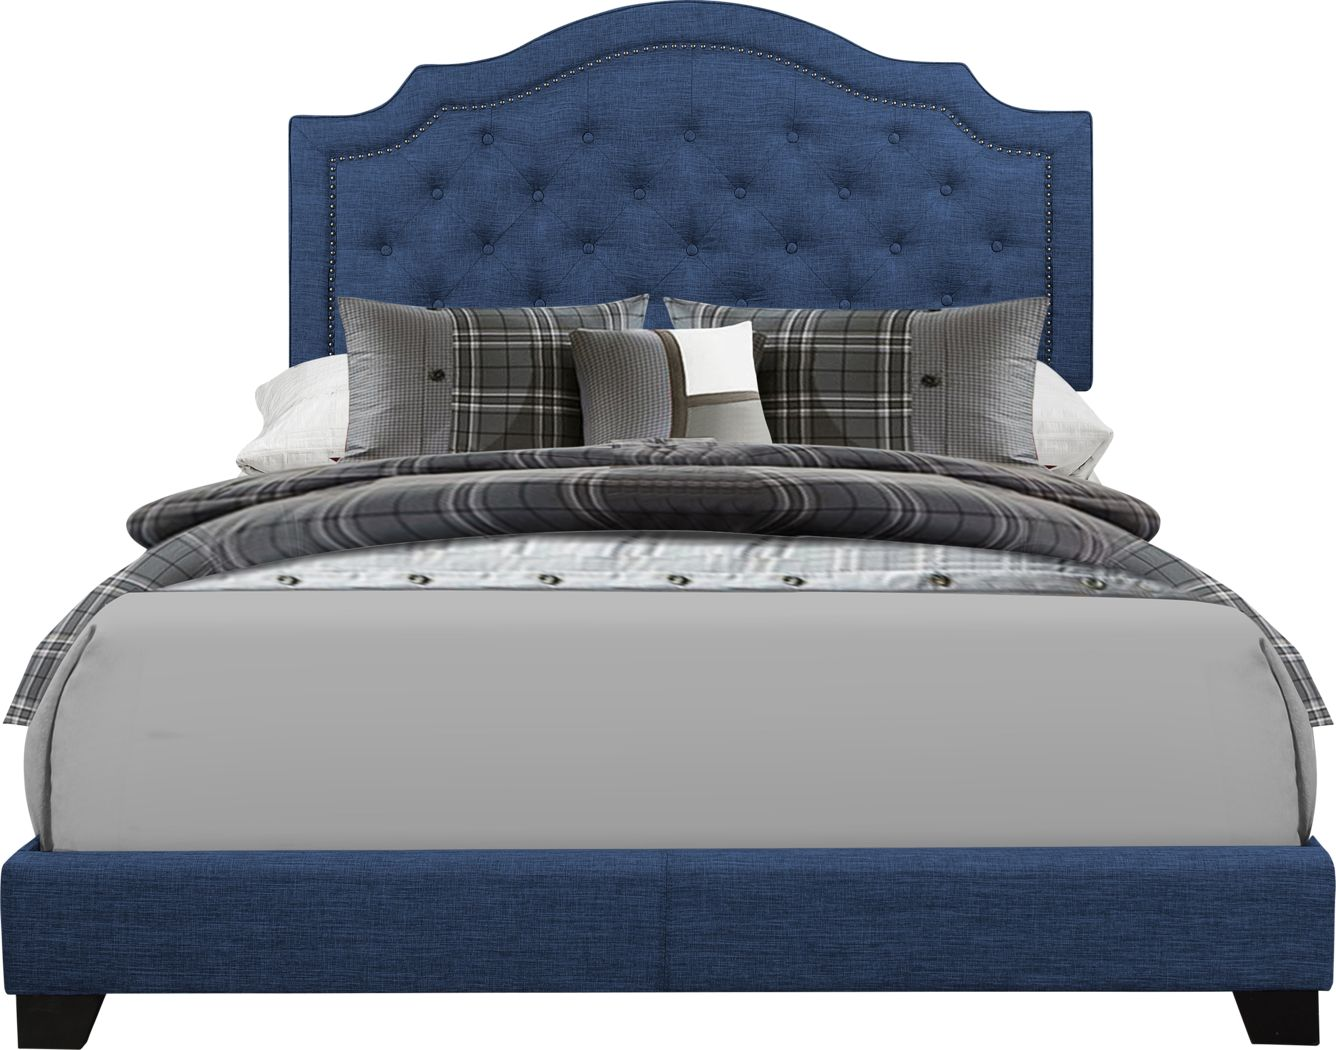 Bowerton Blue King Upholstered Bed